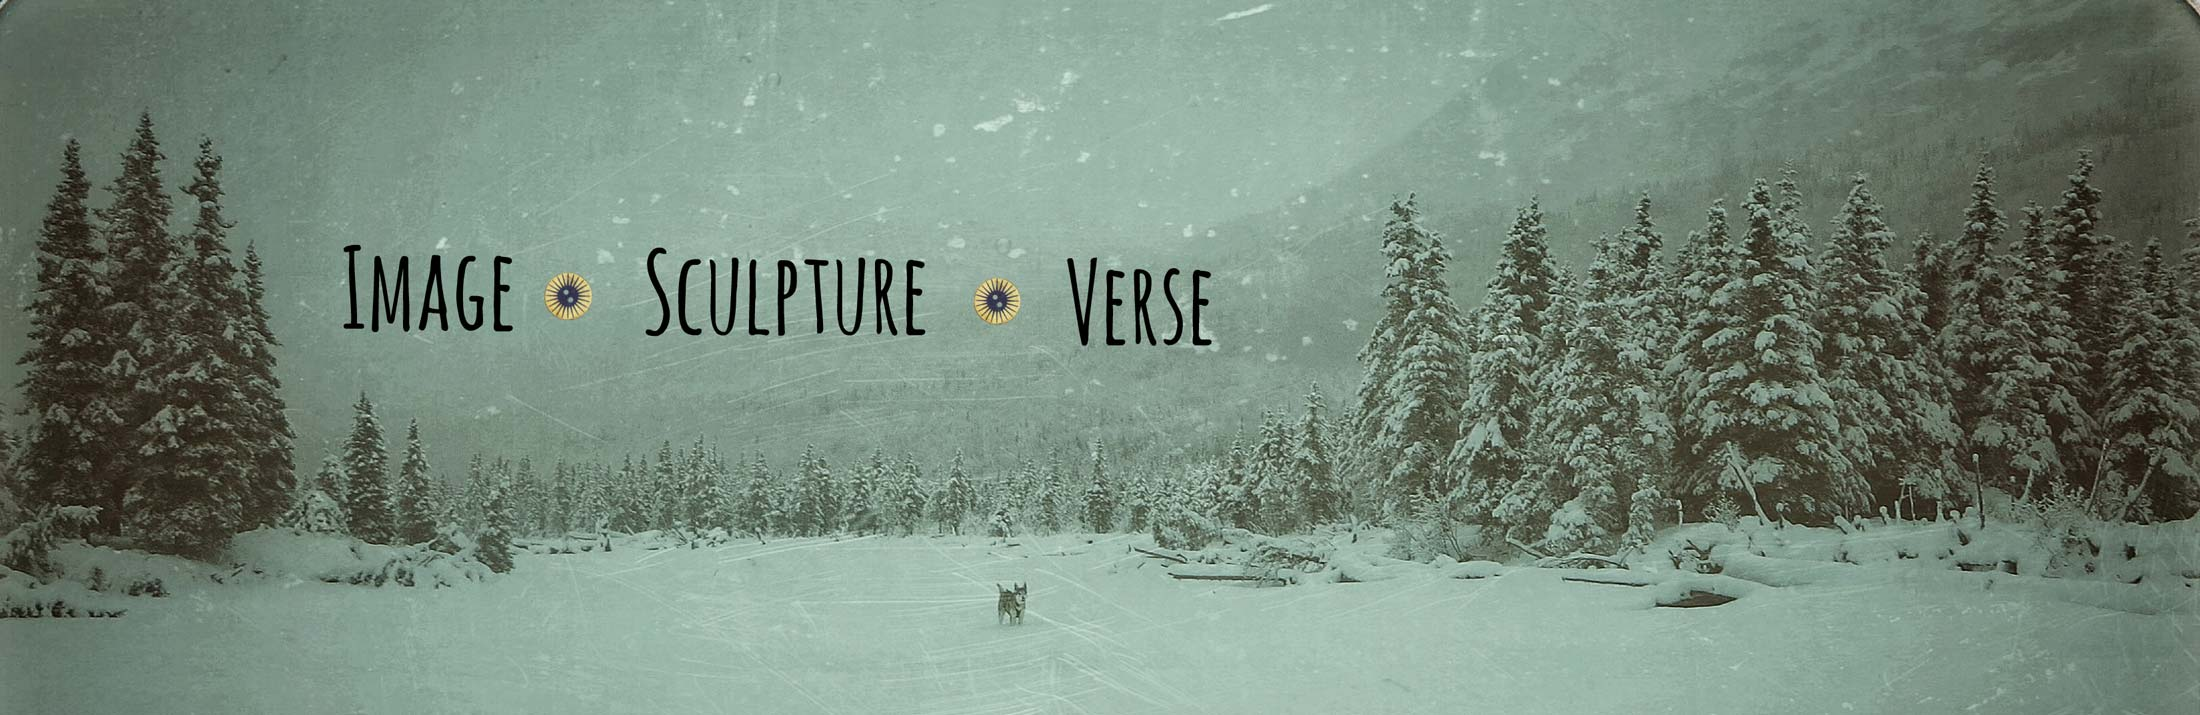 Image-Sculpture-Verse-Banner_1_2200